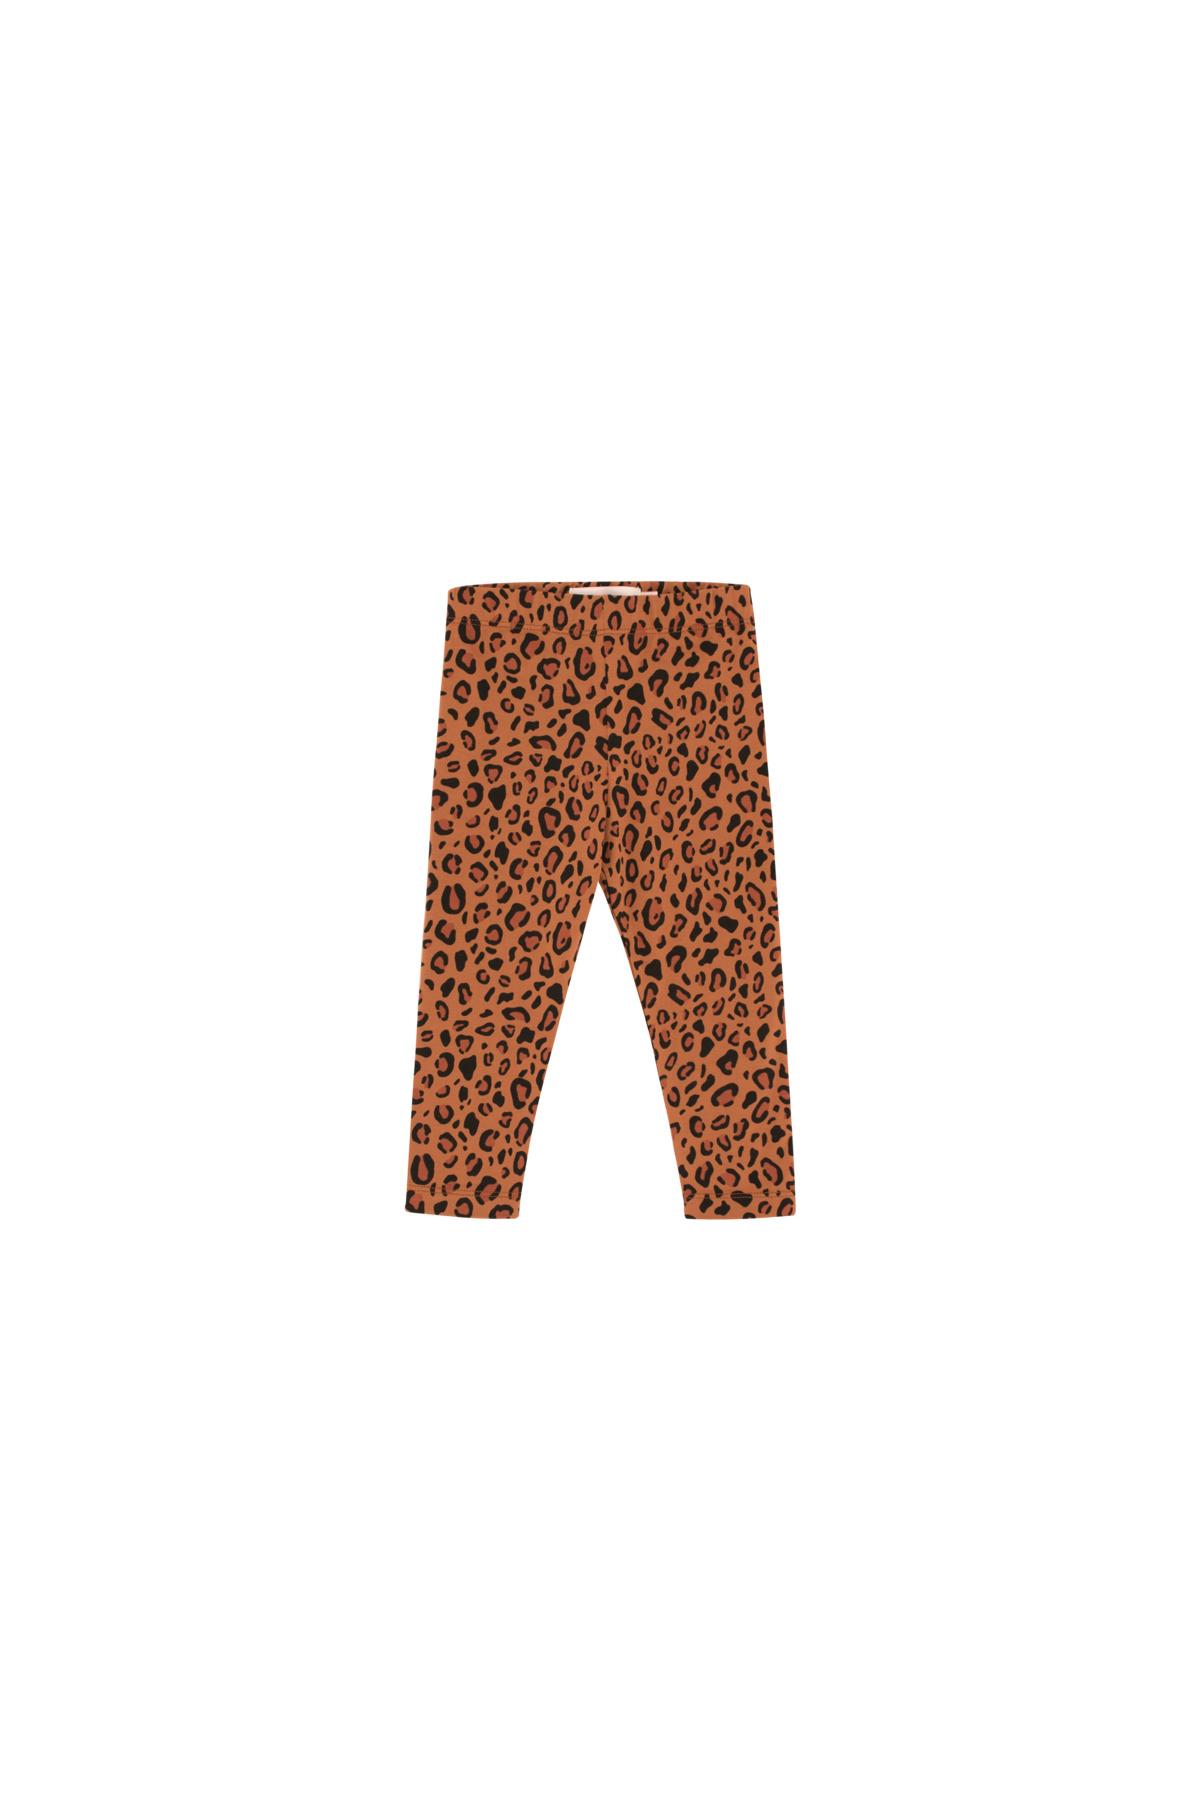 Tiny Cottons Animal print pant | brown/dark brown